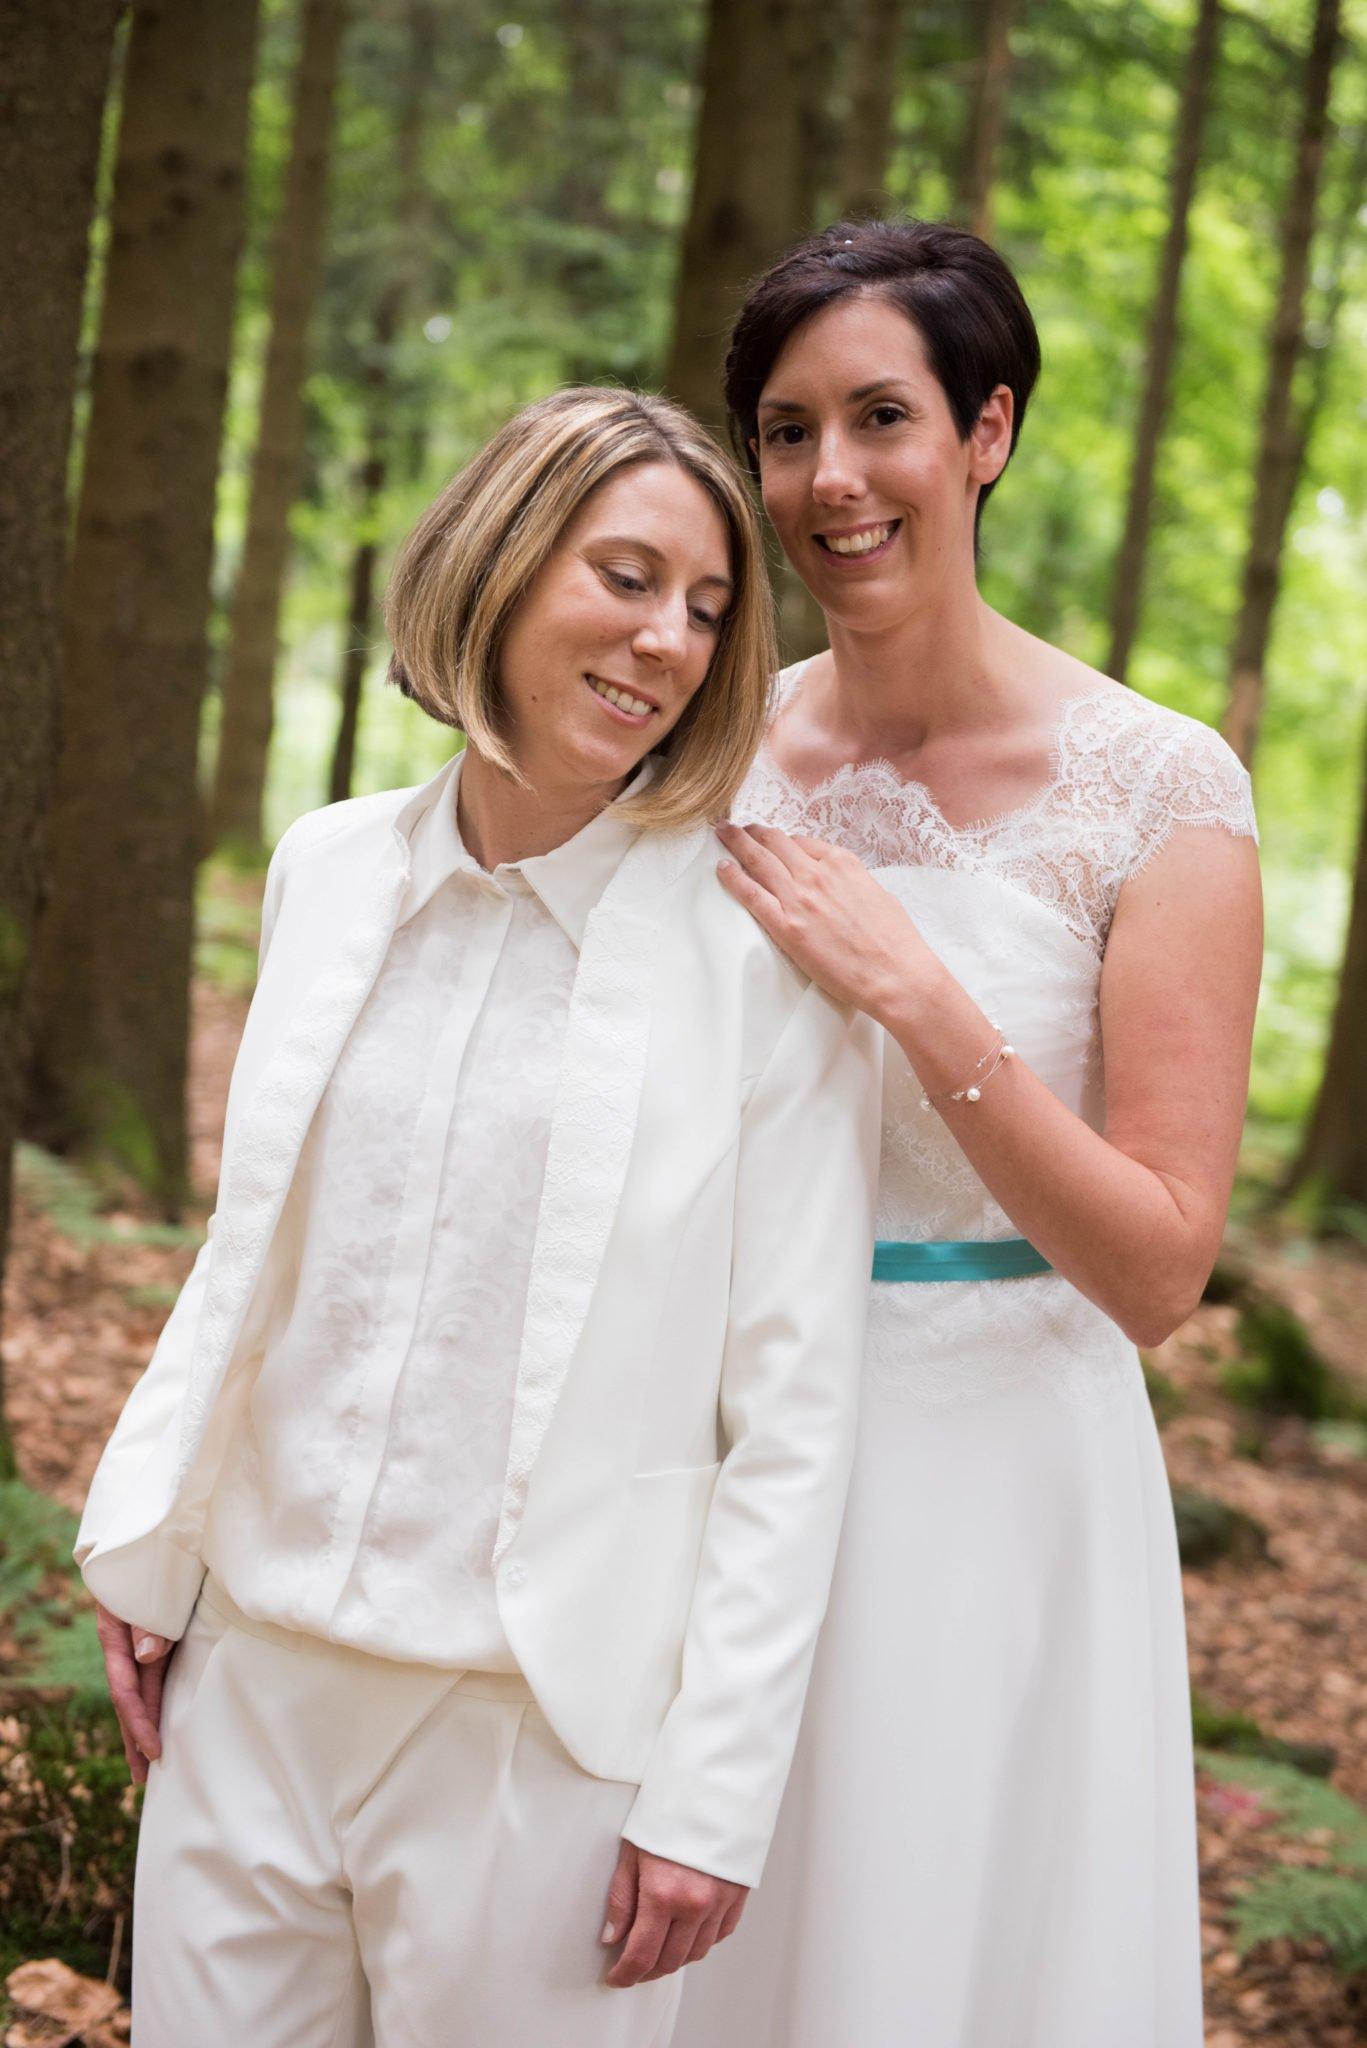 Kathrin & Jenna Hochzeit